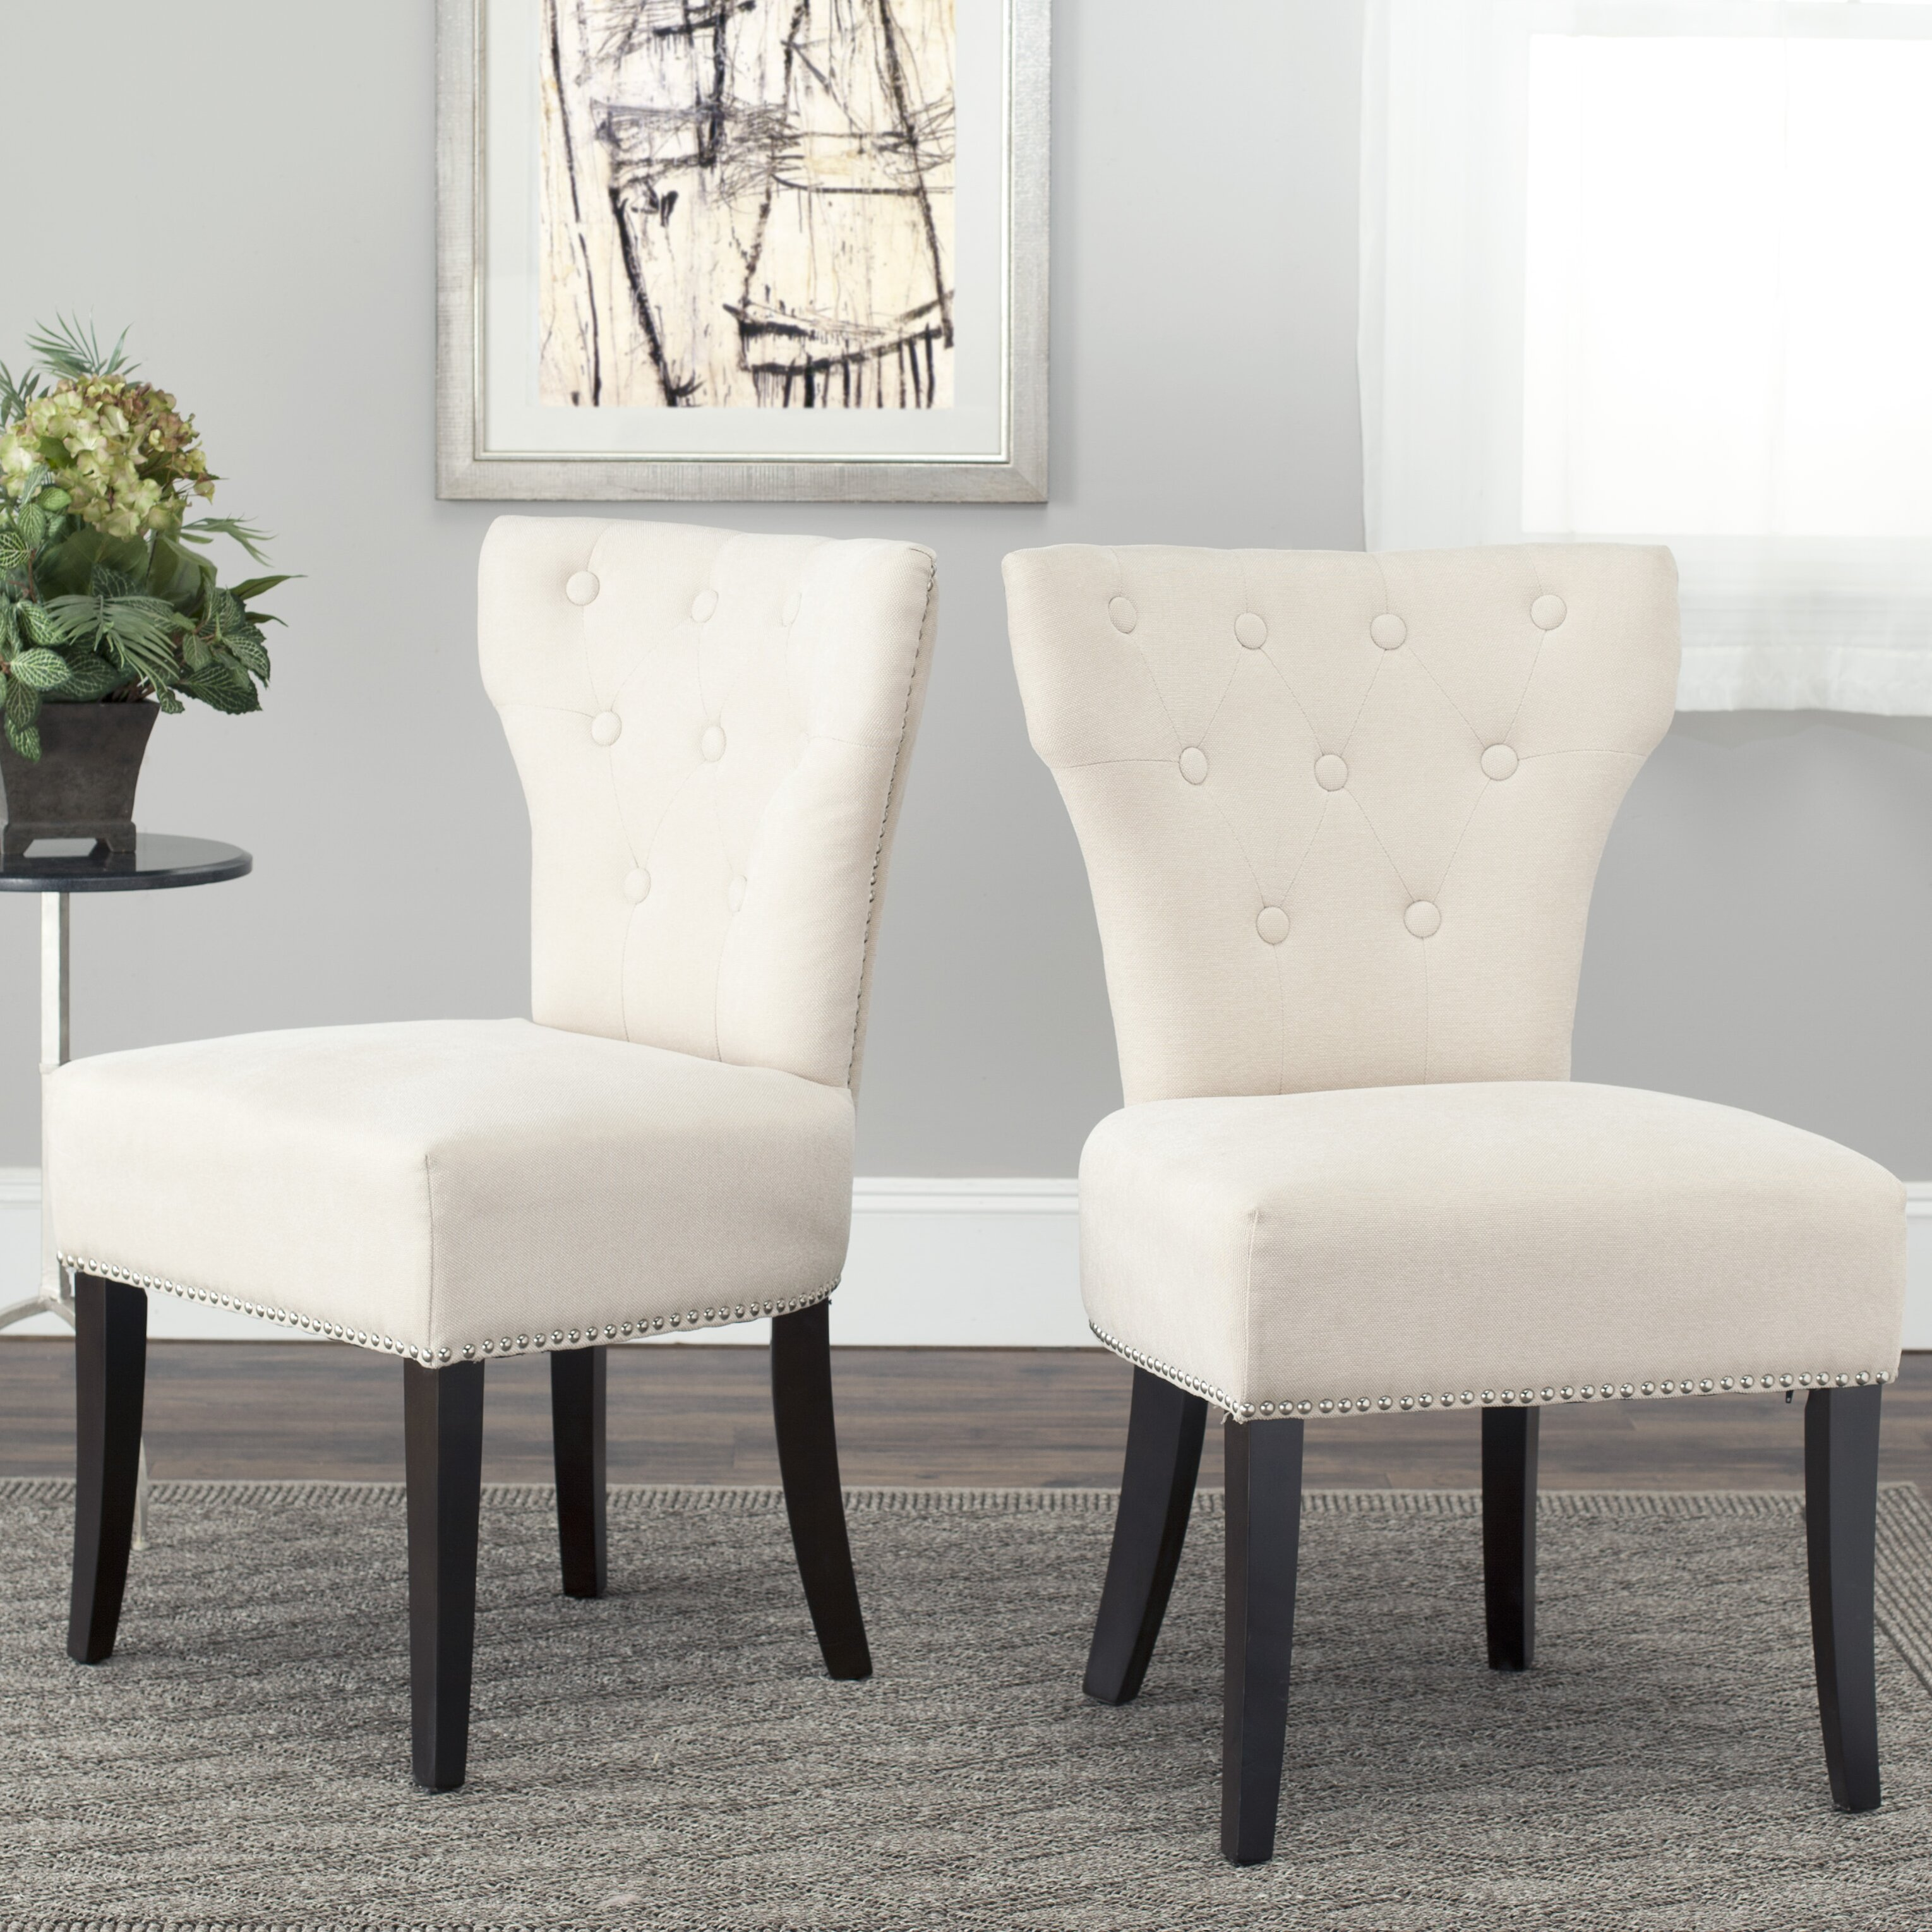 Safavieh Dining Chairs: Safavieh Scarlett Side Chair & Reviews